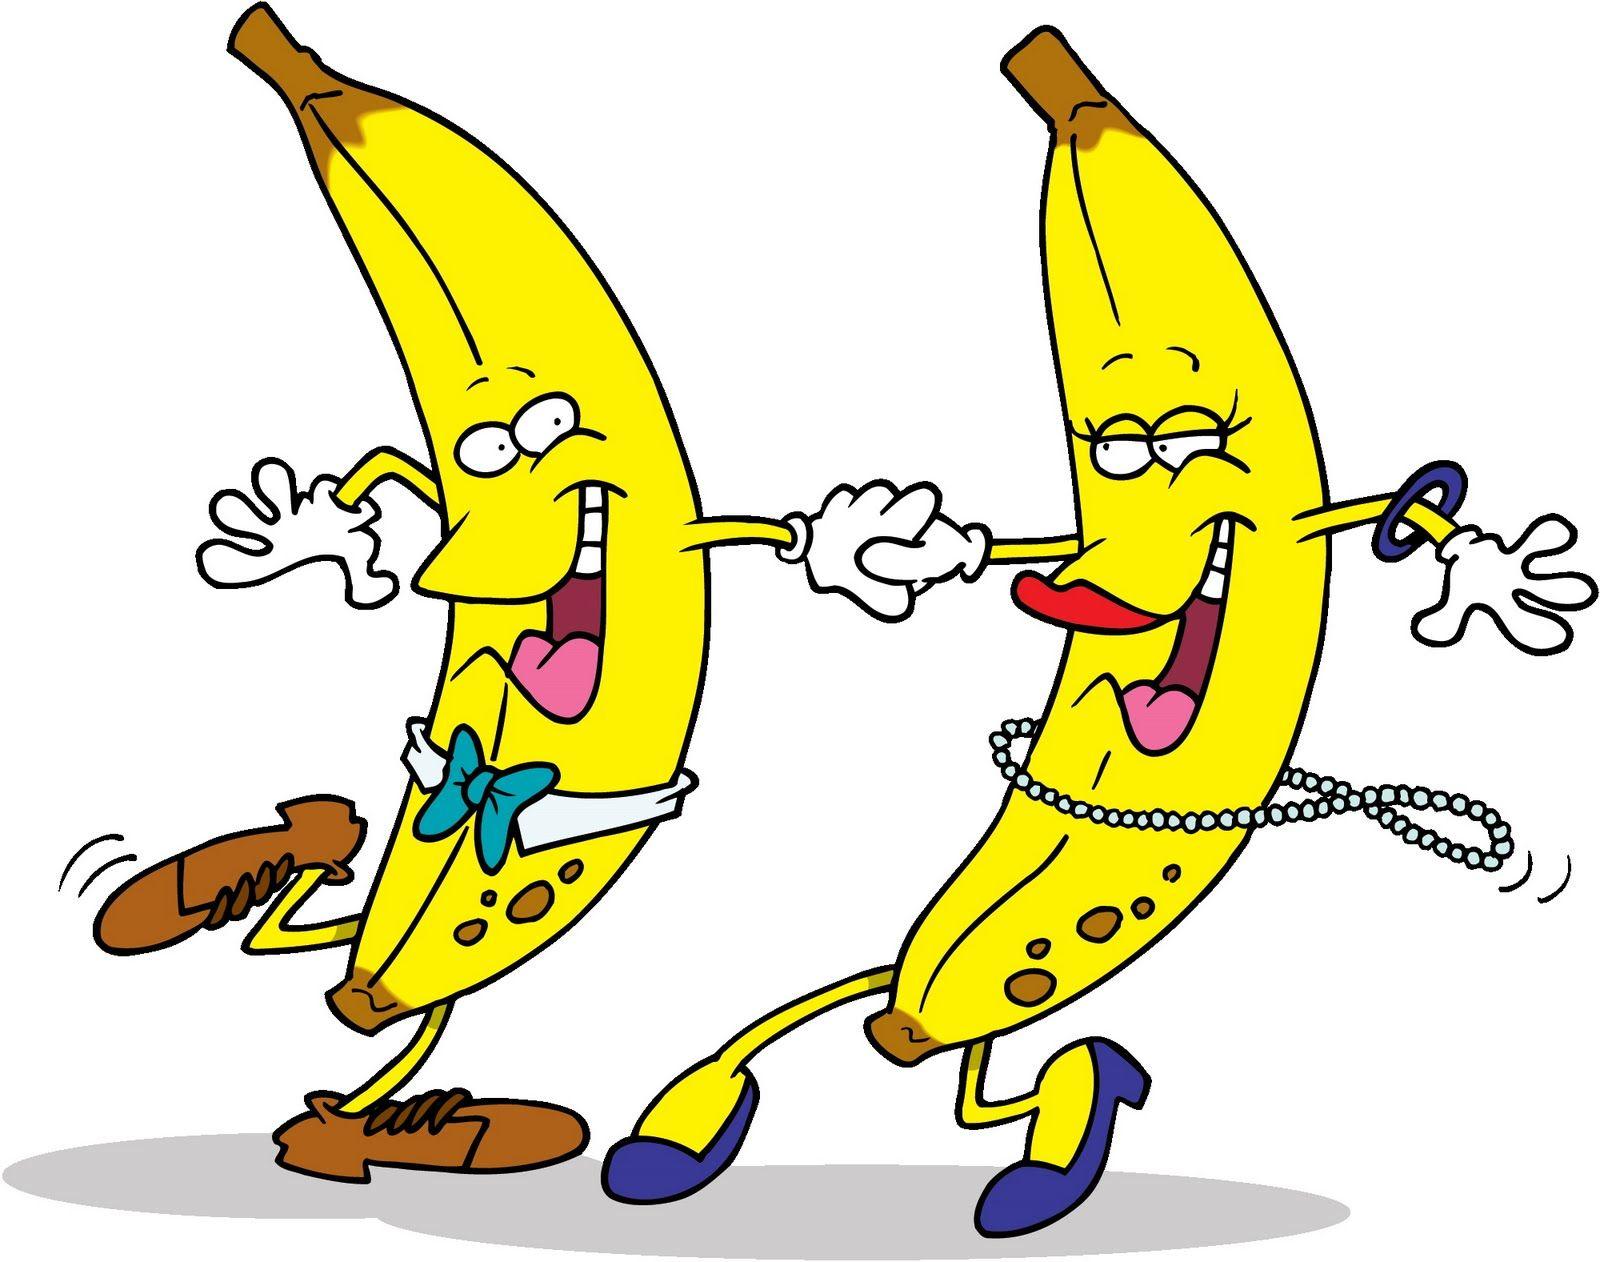 Banana royalty free. Pin by satu suomalainen